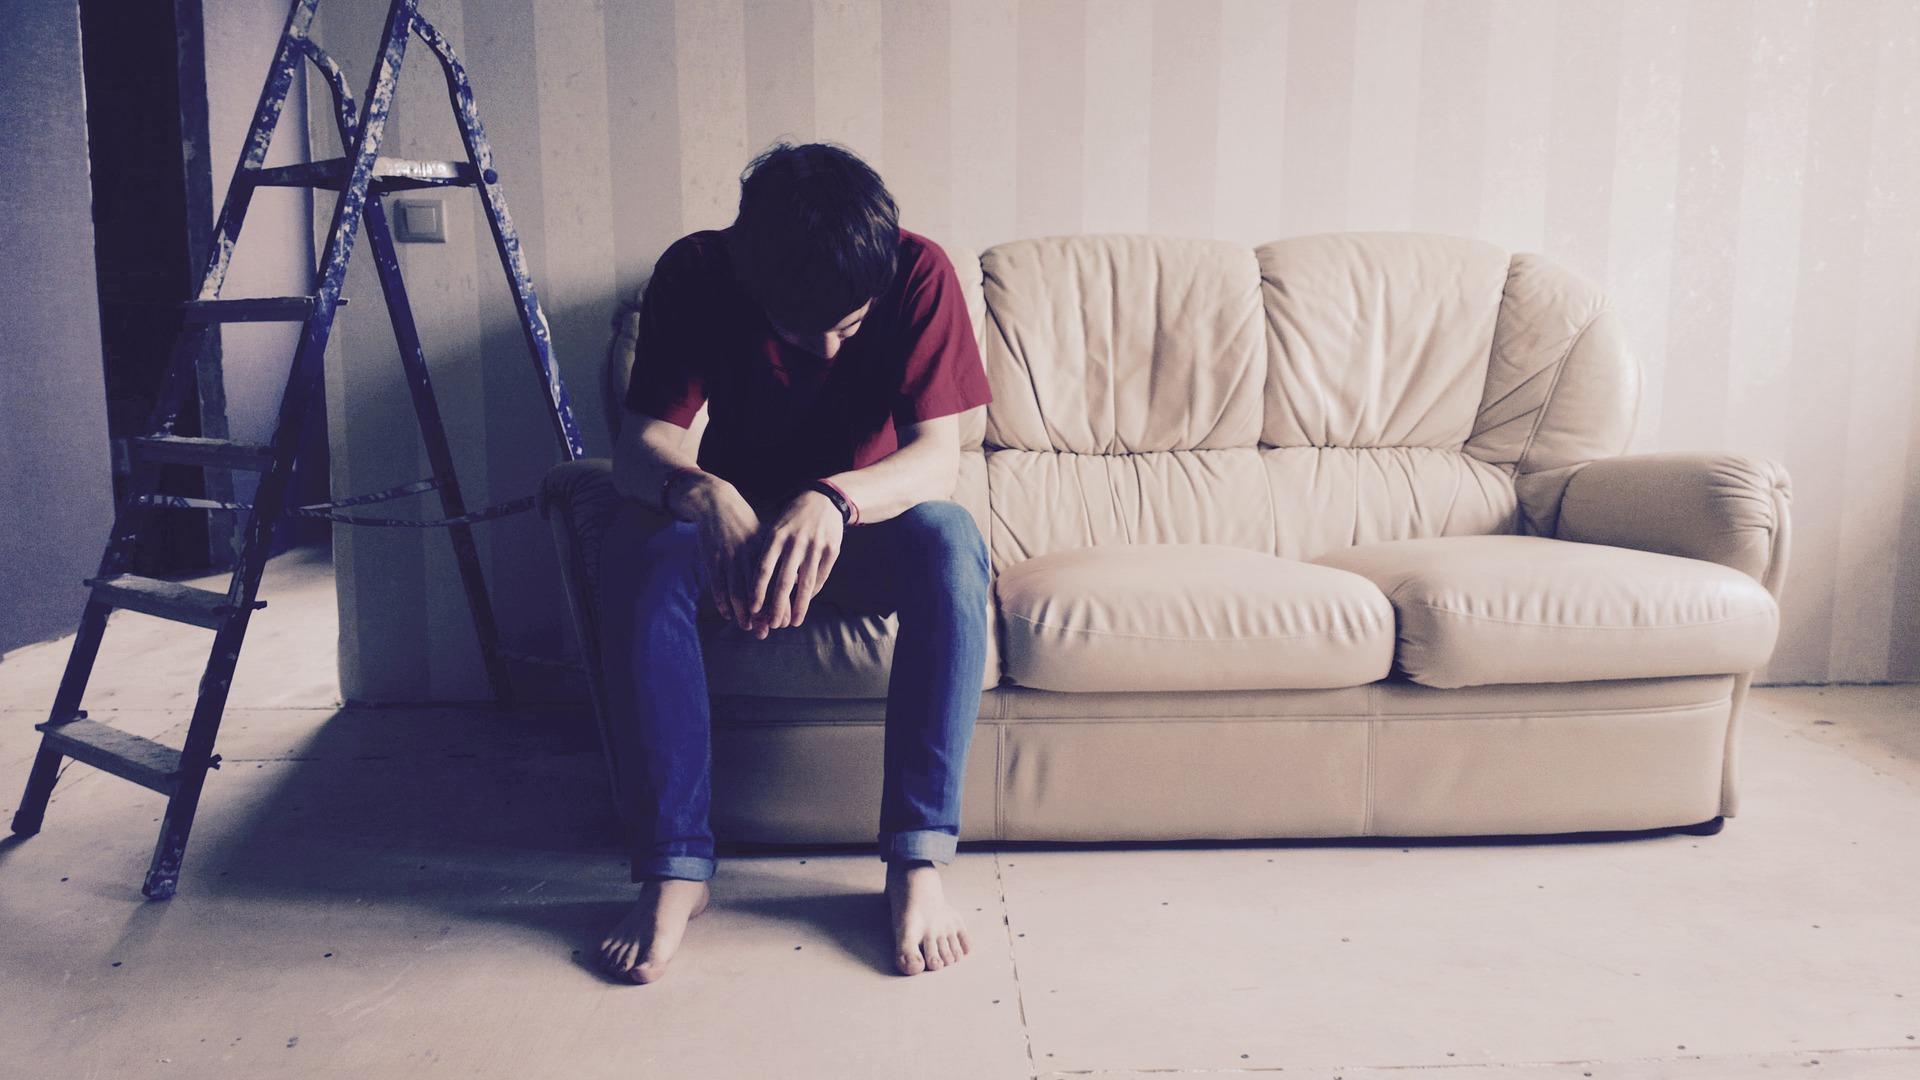 Soporte Psicológico A Personas Con COVID Persistente